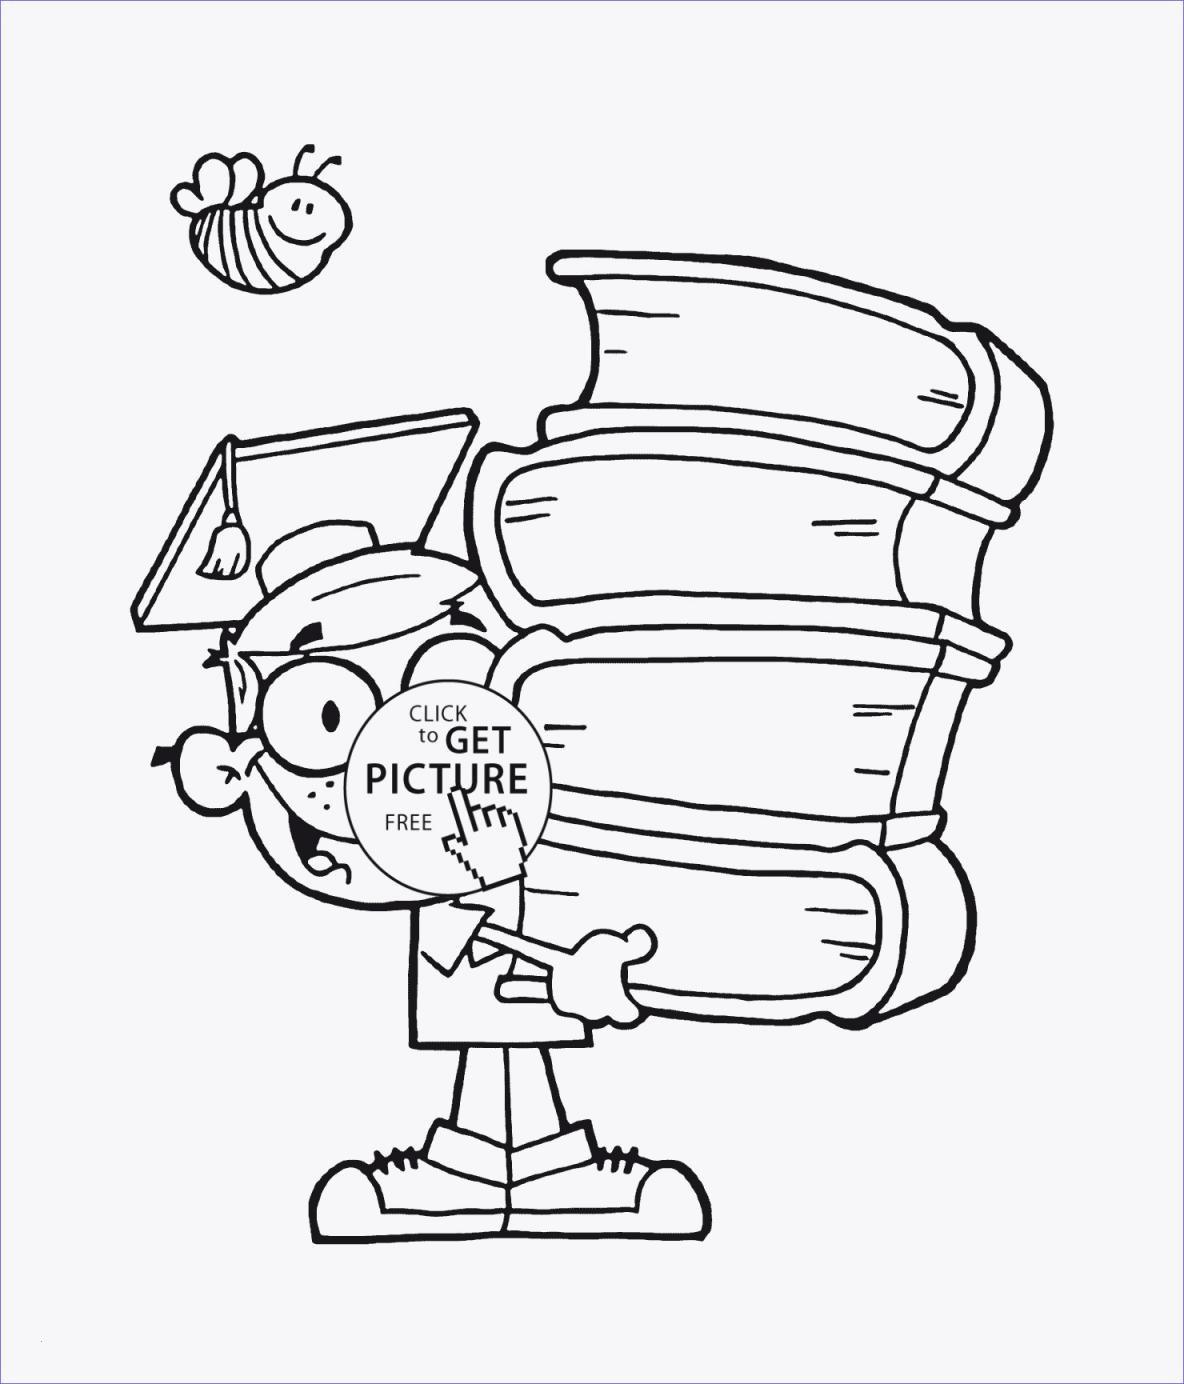 Ausmalbild Ninjago Drache Neu Malvorlagen Igel Frisch Igel Grundschule 0d Archives Uploadertalk Stock